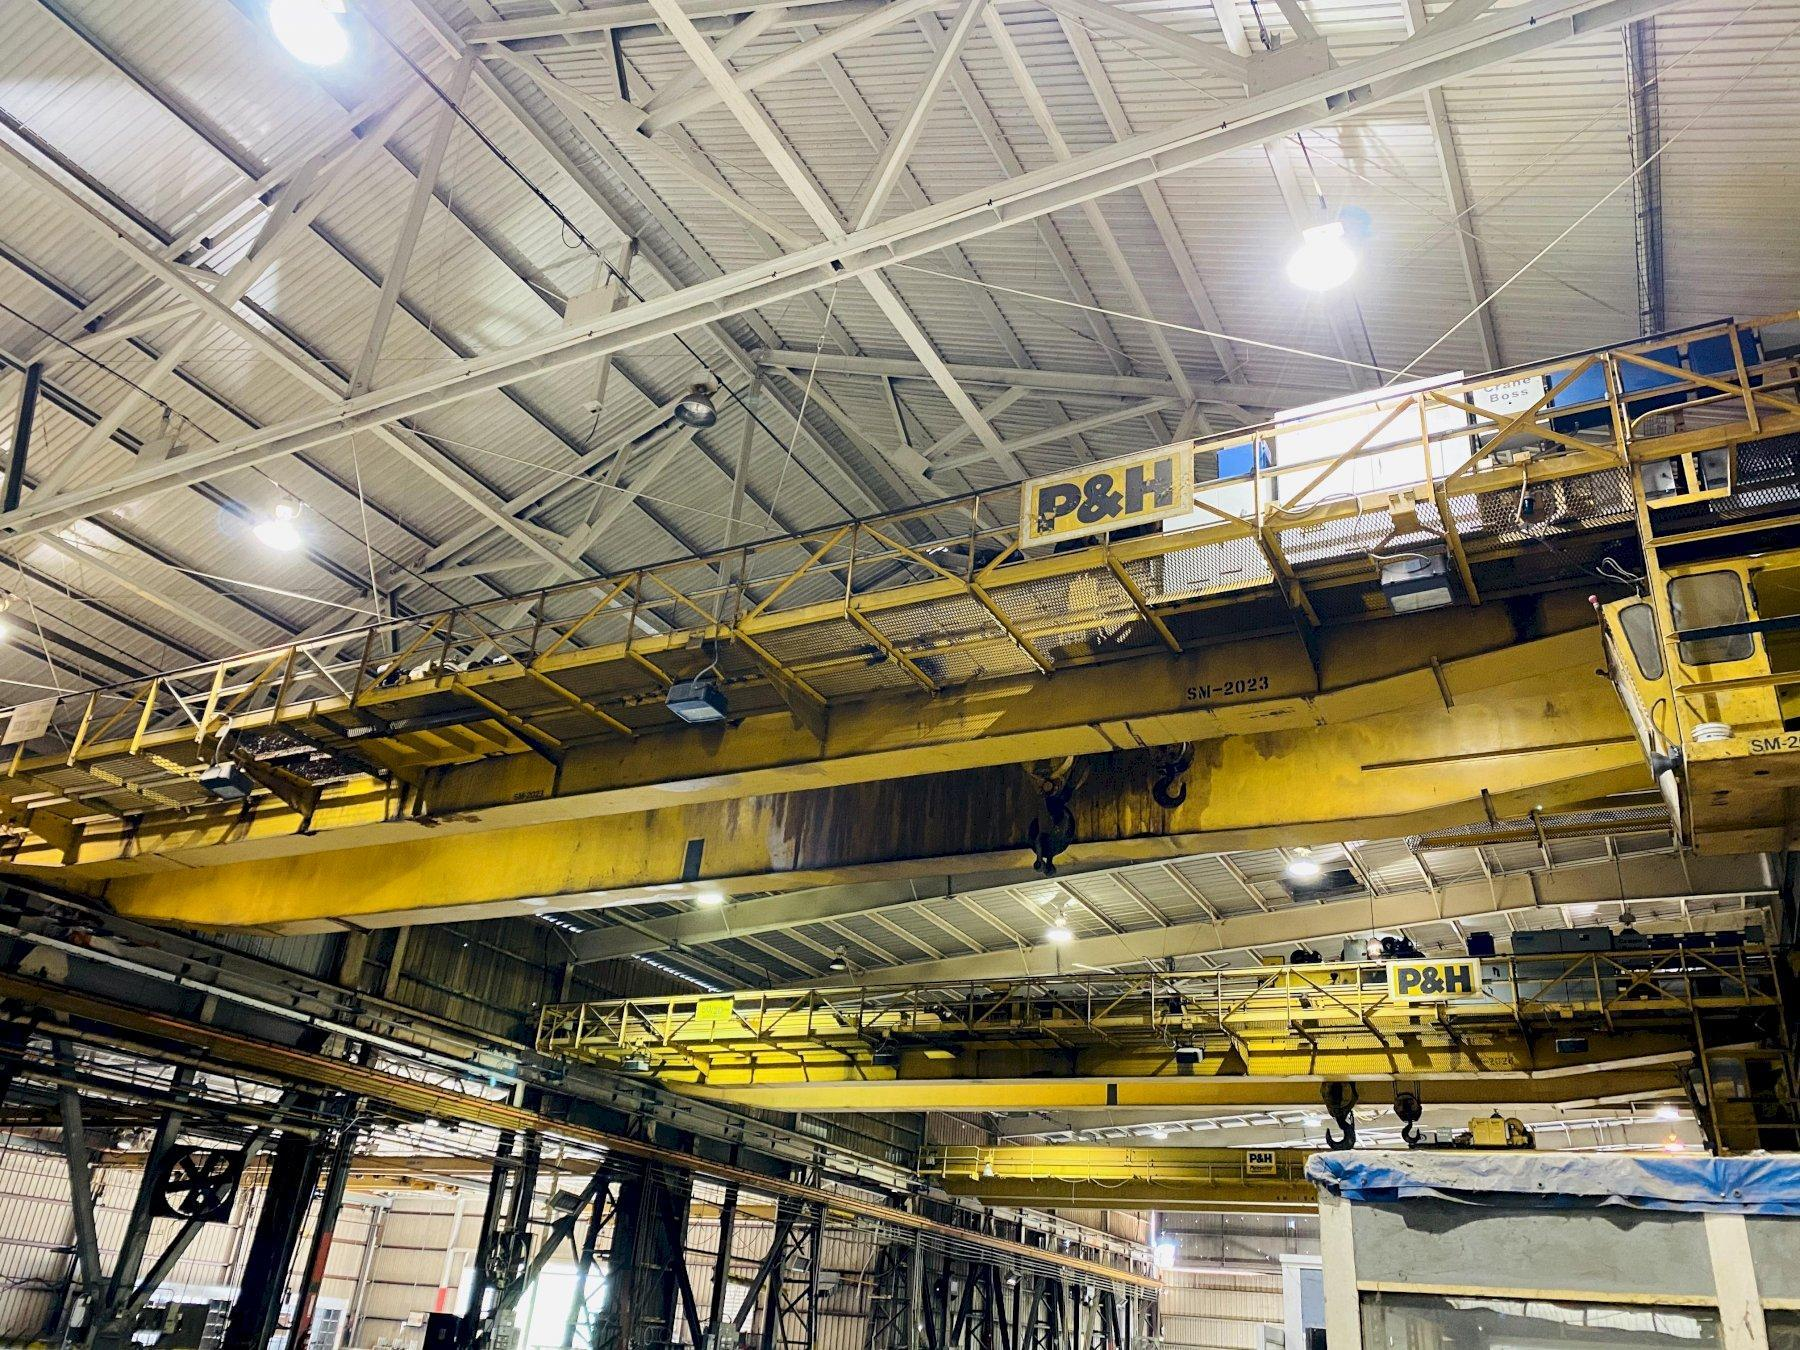 "50 TON X 103'6"" P&H OVERHEAD BRIDGE CRANE WITH 20 TON AUXILIARY. STOCK # 0733520"